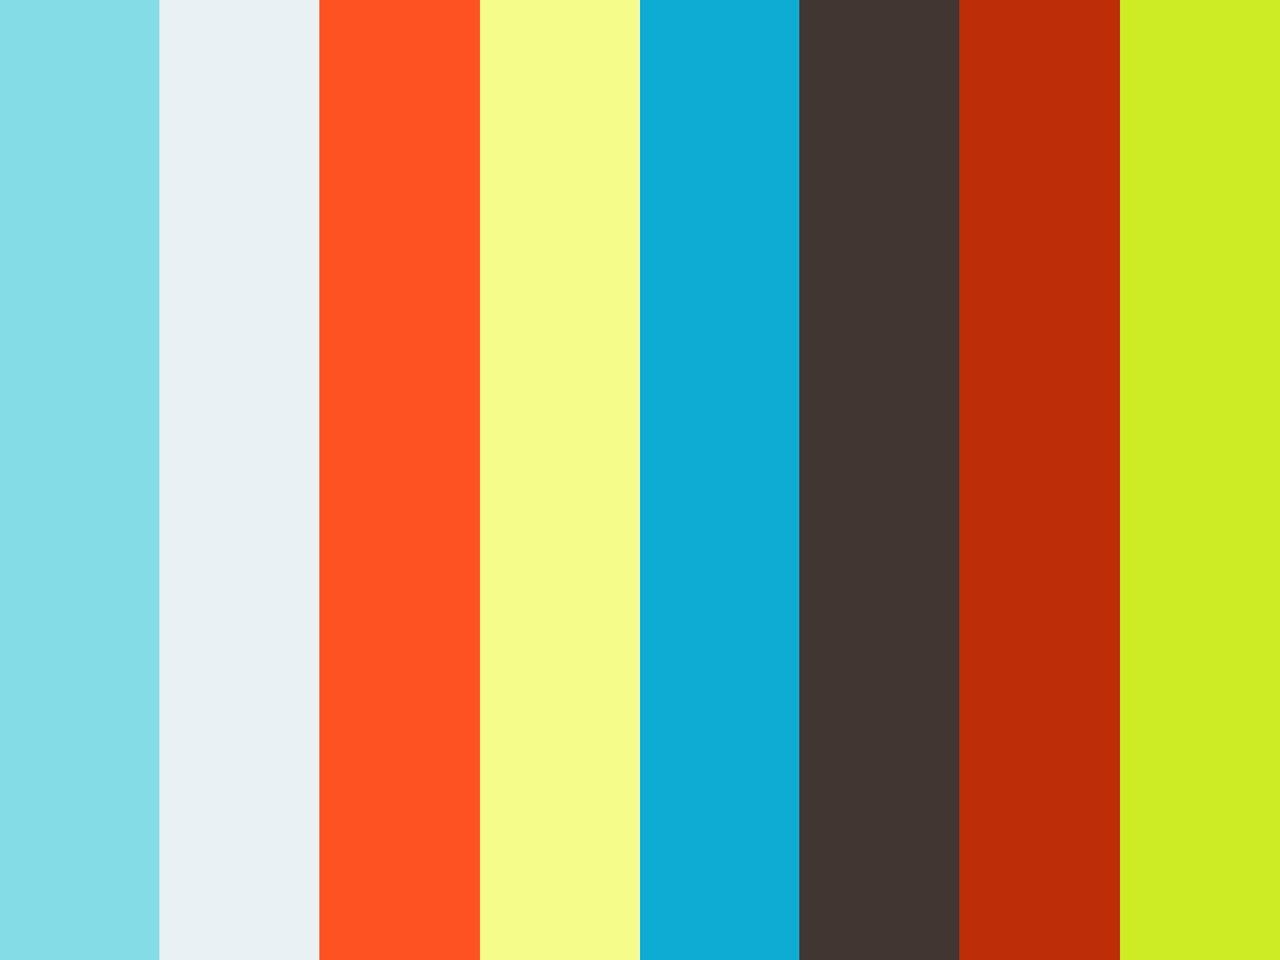 171014 CARONNESE-DERTHONA - INT VISCA